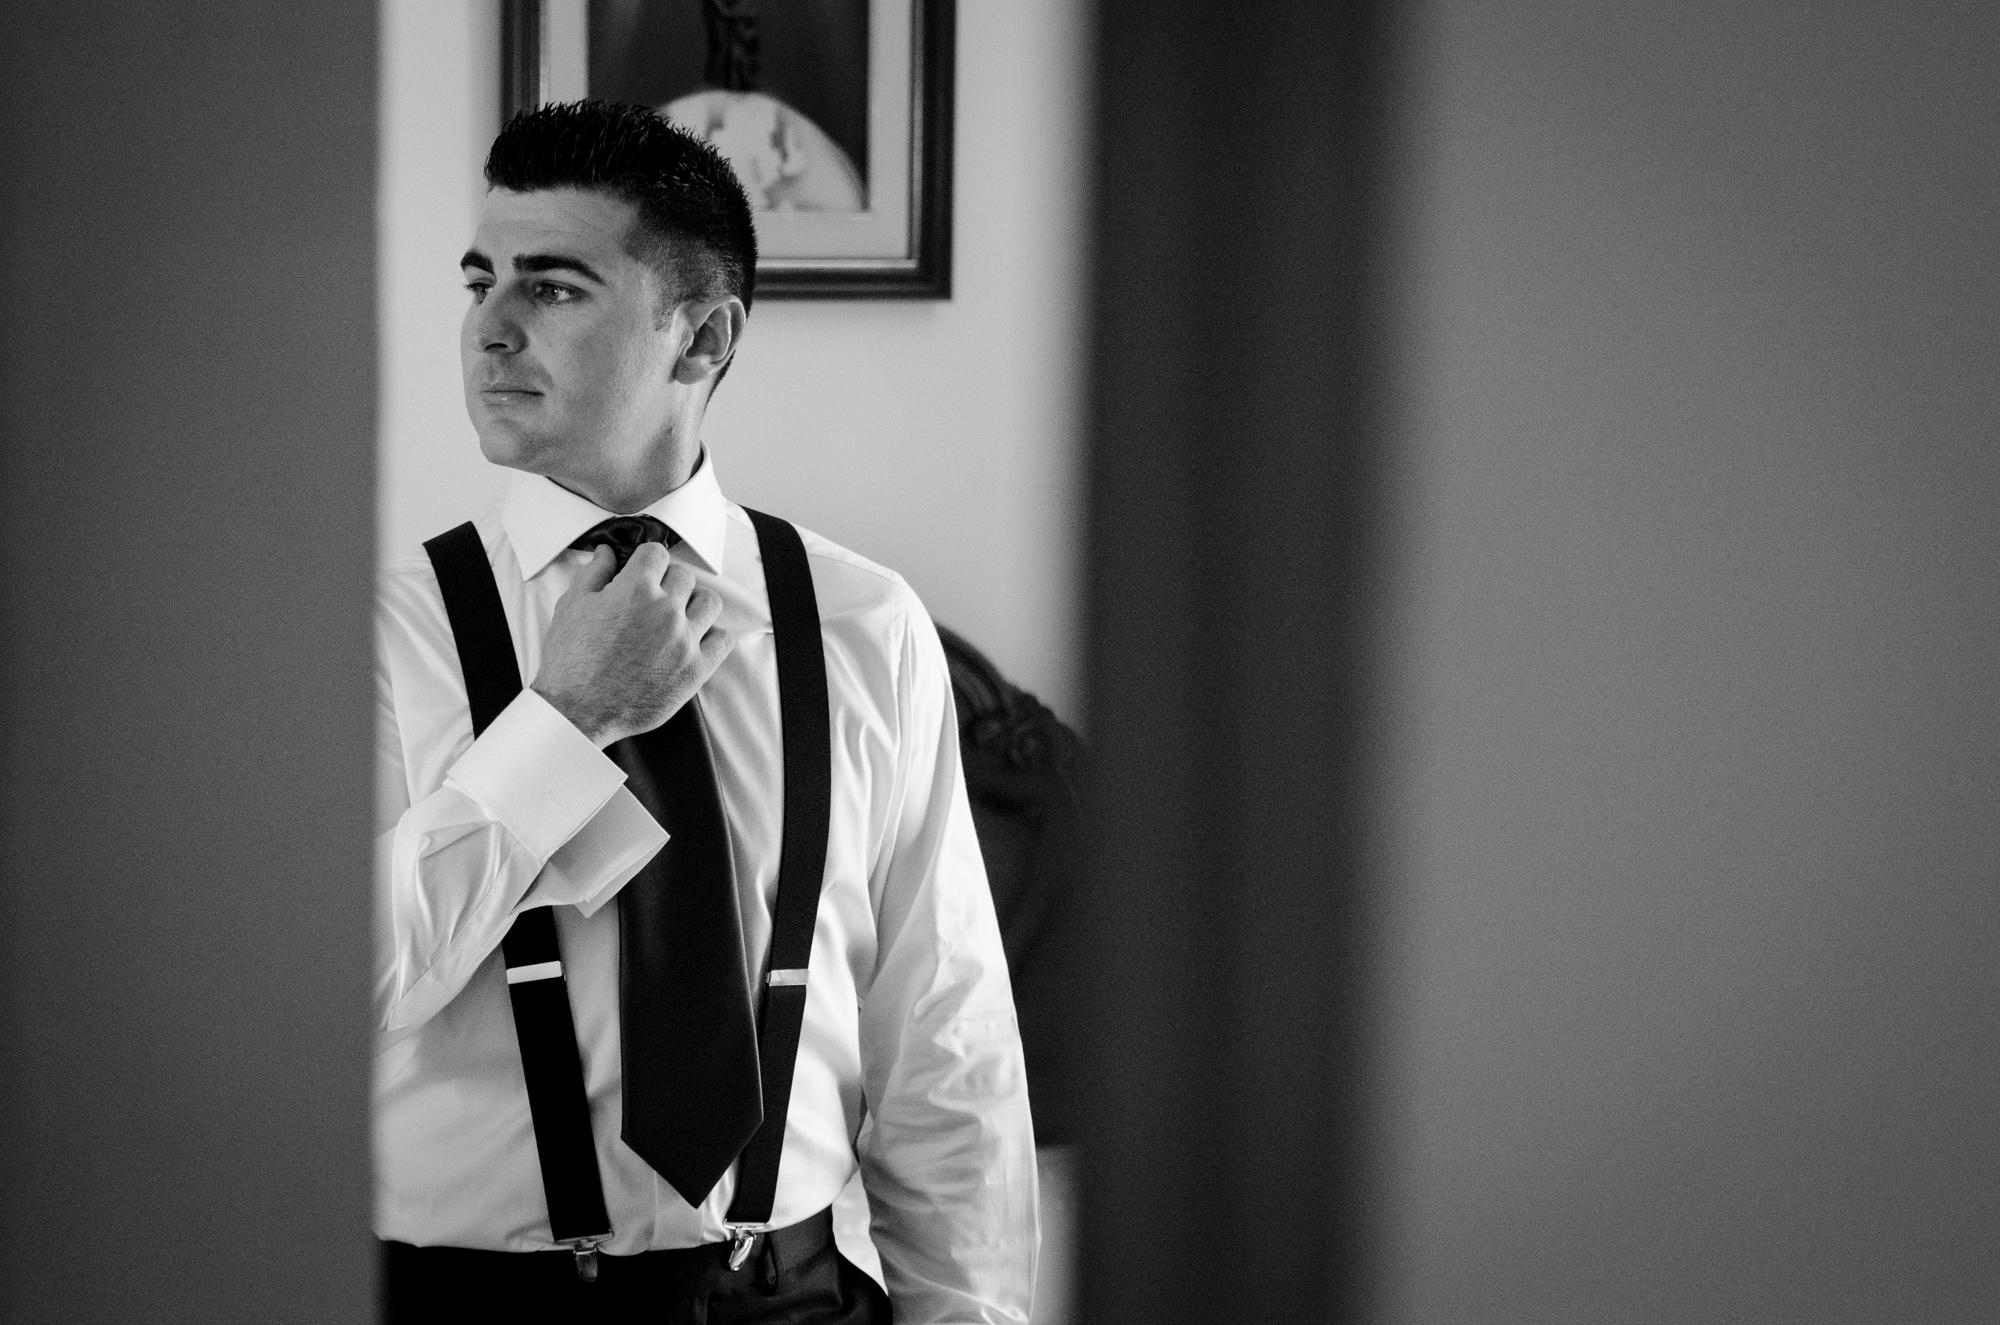 fotografos-de-boda-guadalajara.jpg